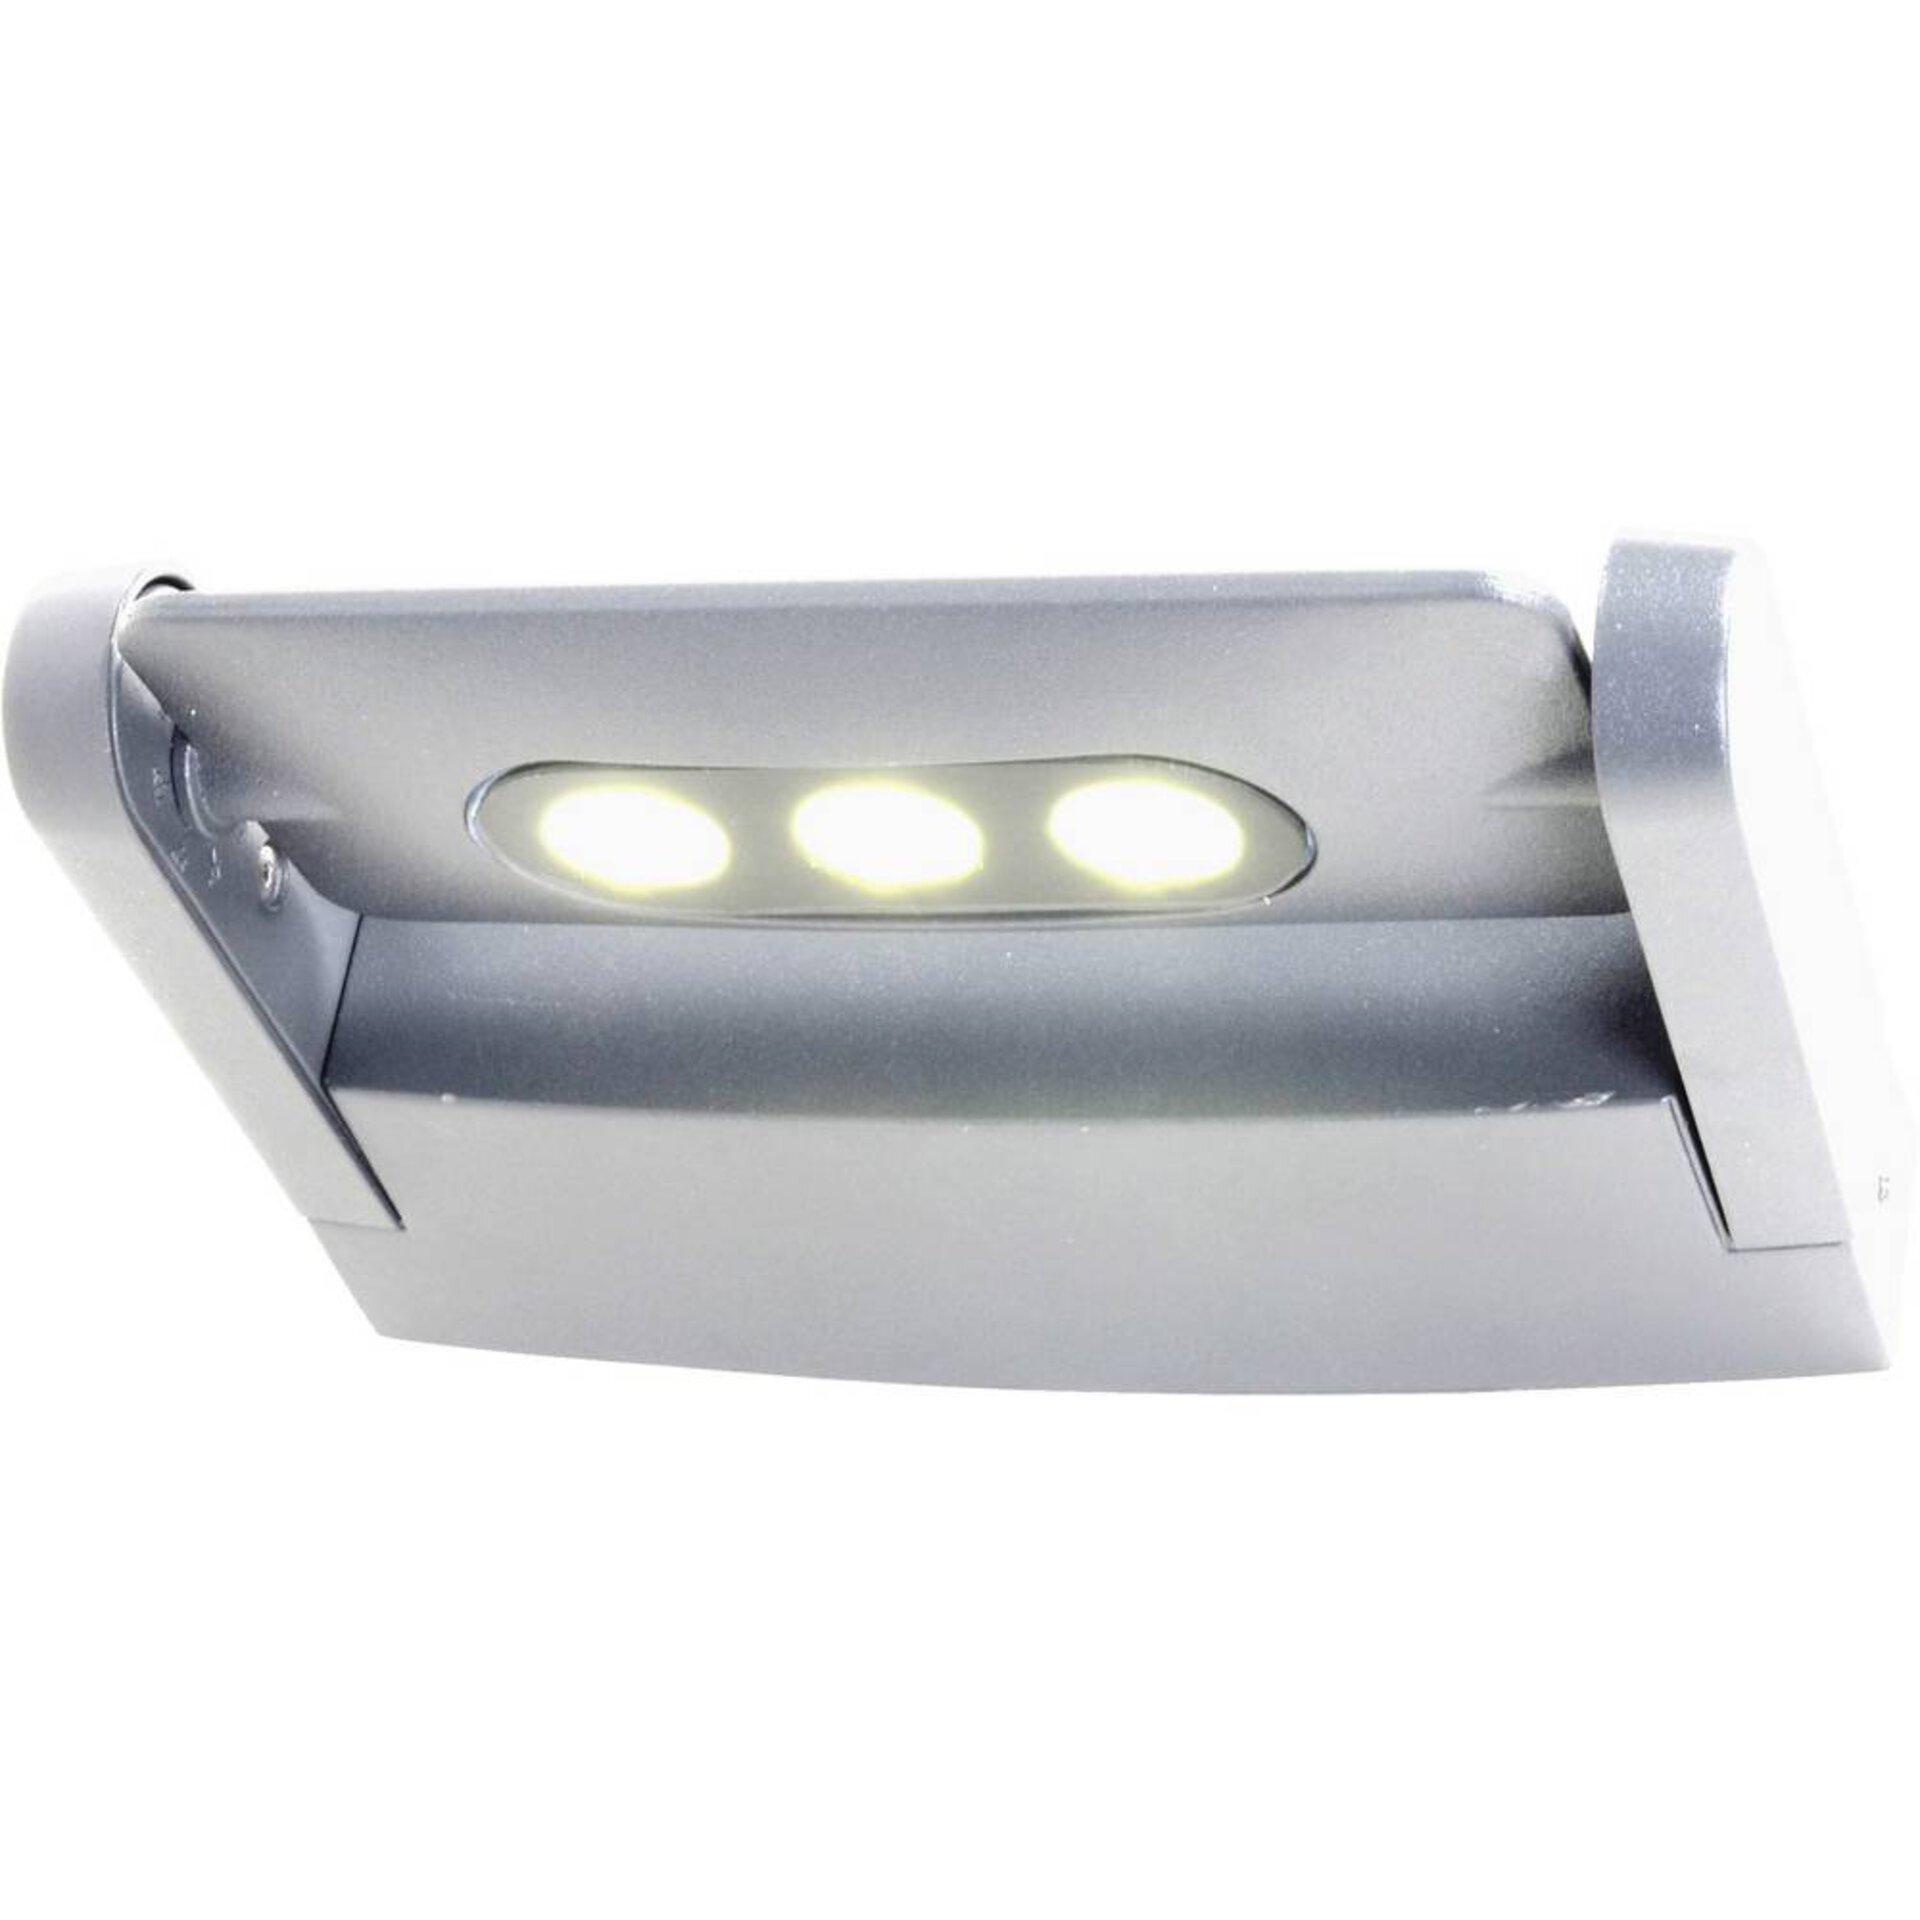 Wand-Aussenleuchte Mini LEDSpot Eco-Light Metall grau 21 x 5 x 16 cm